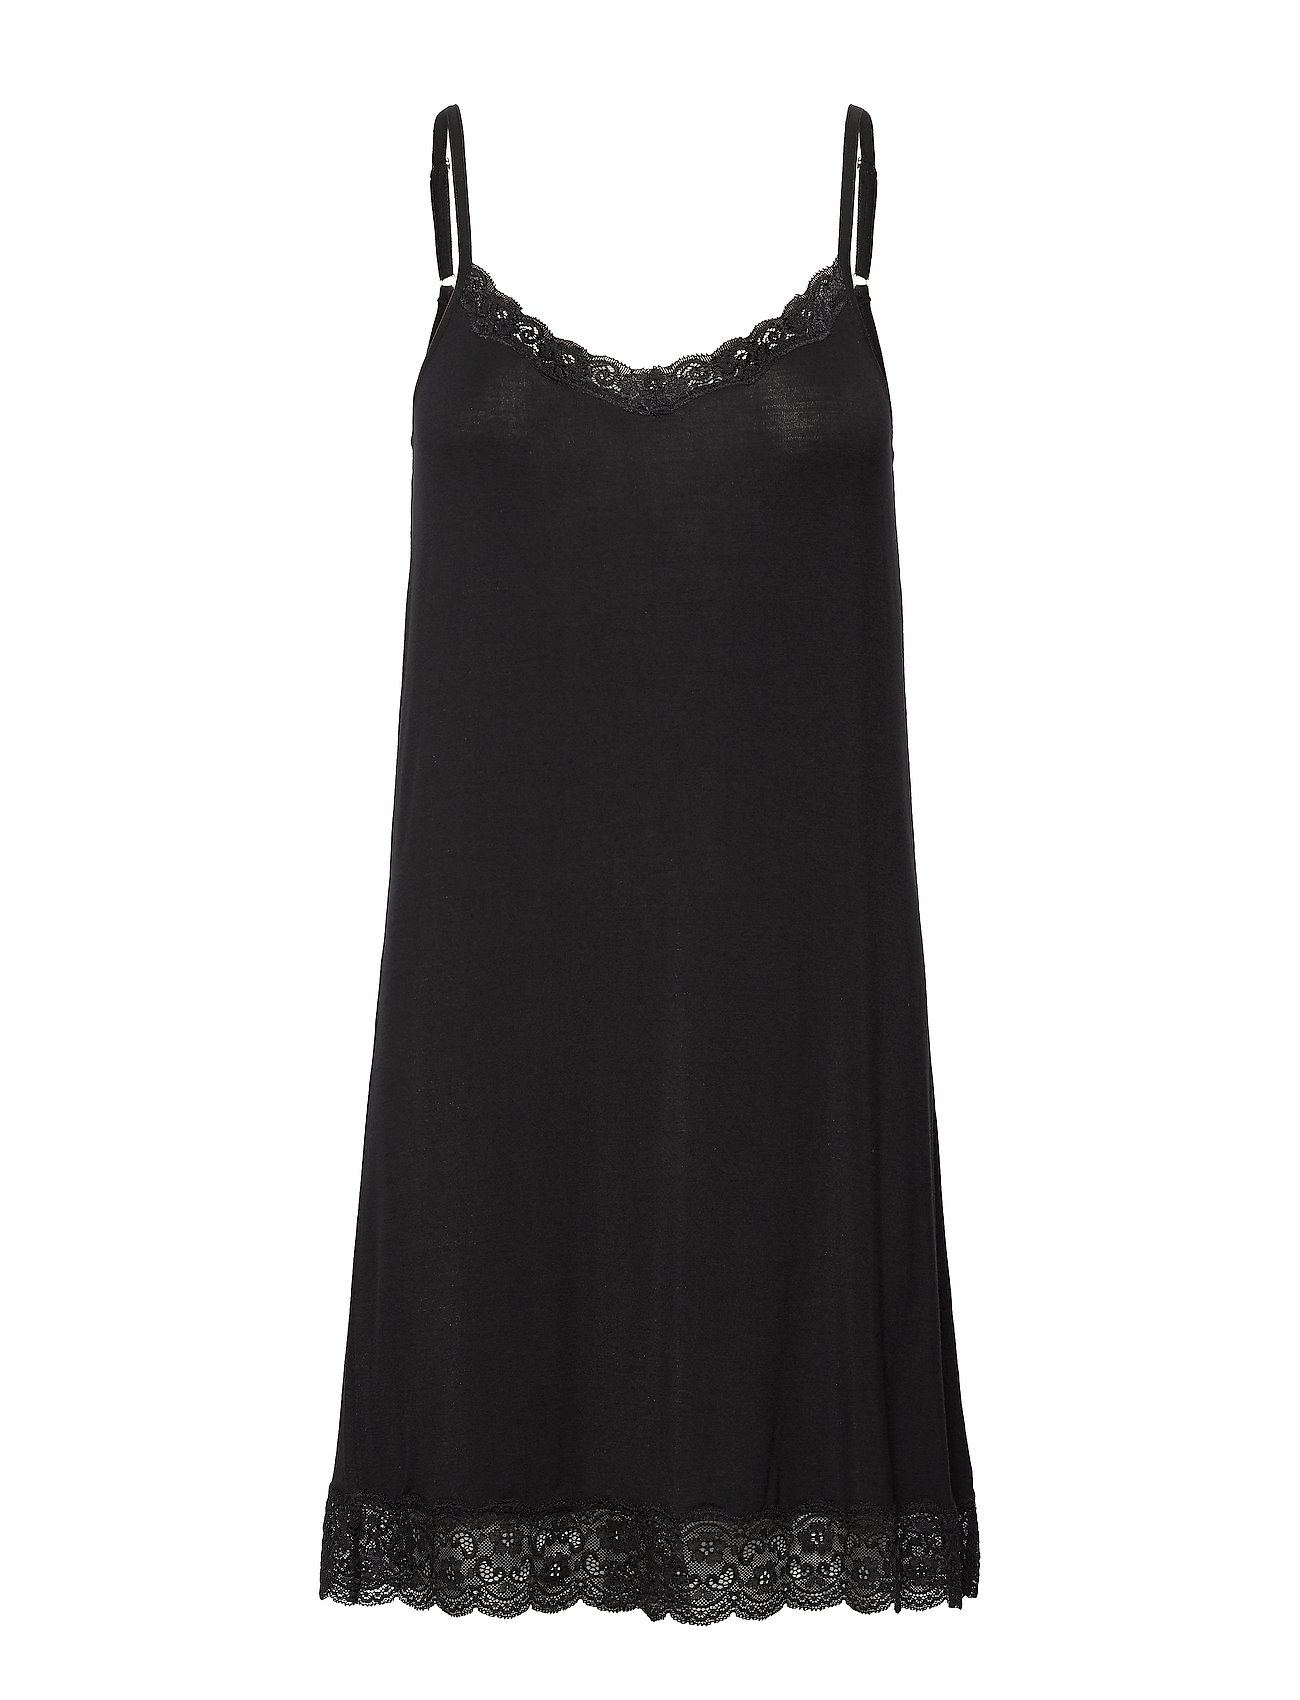 Lady Avenue Bamboo Lace Slip - BLACK